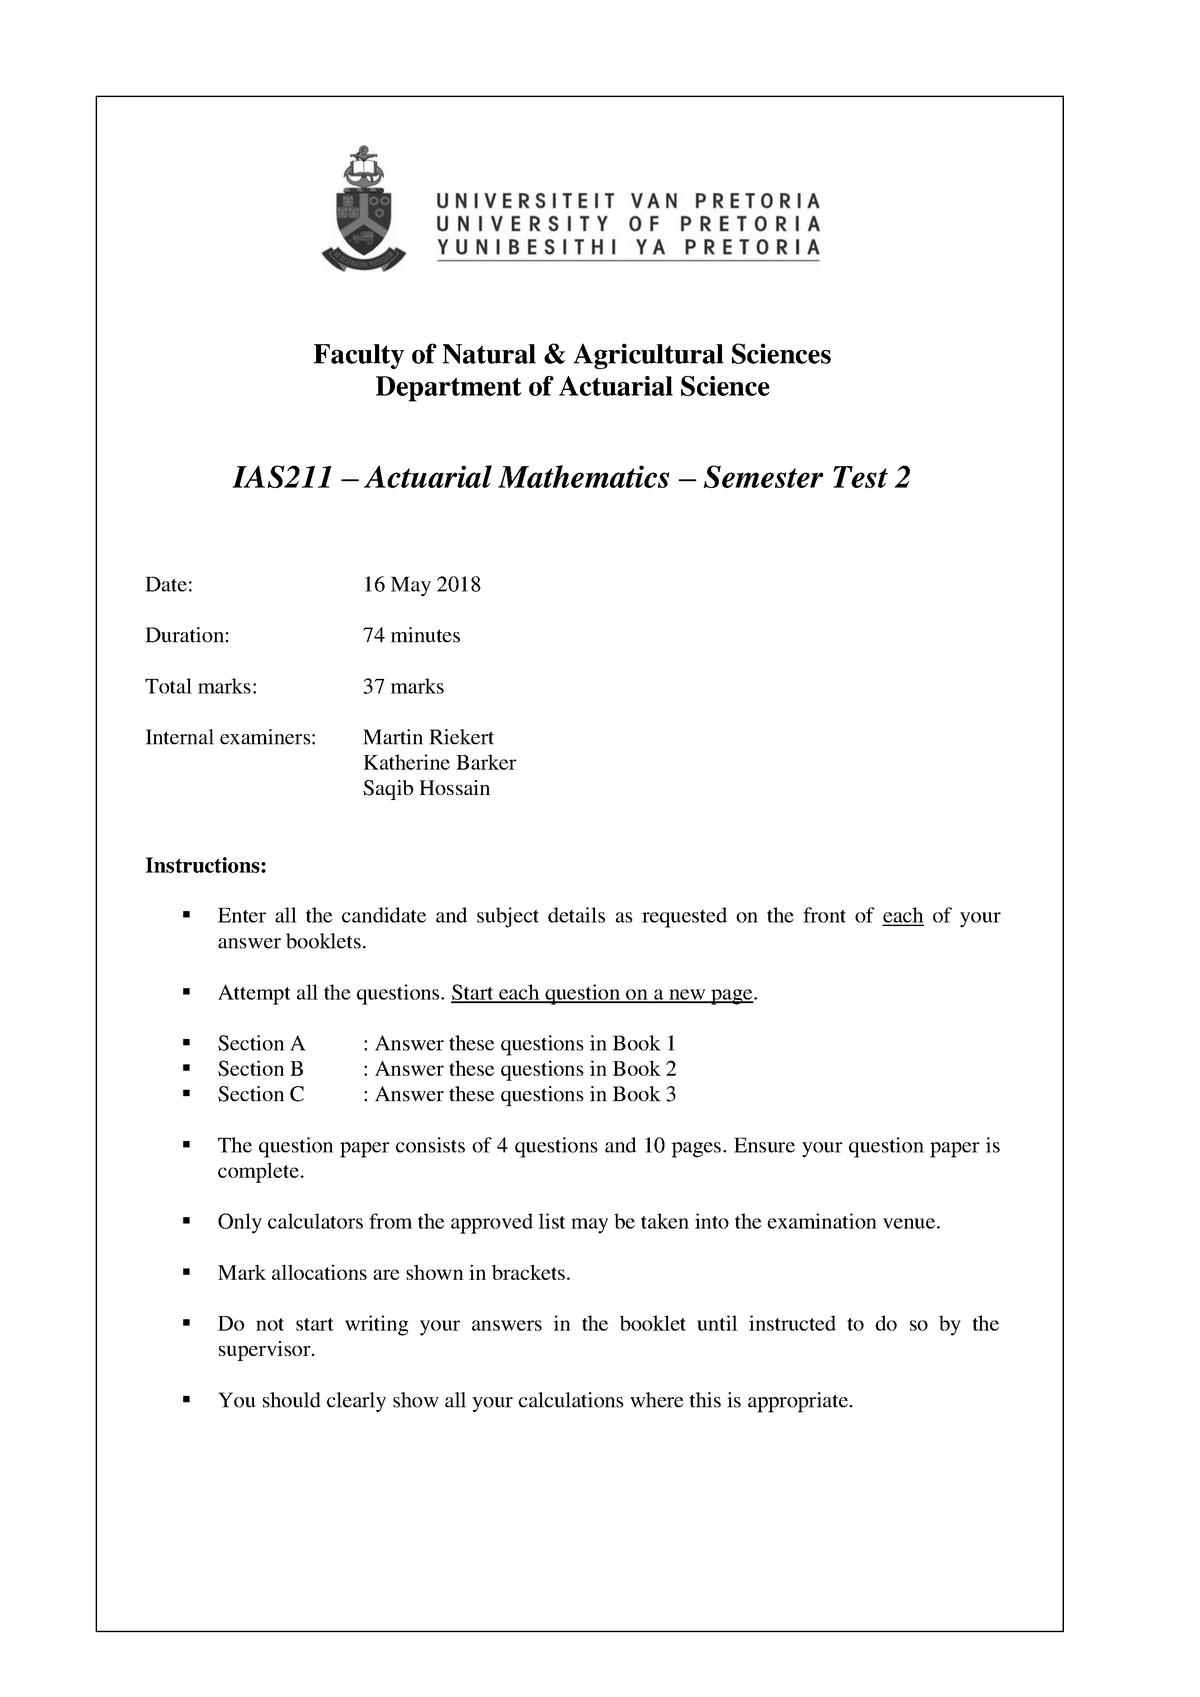 Exam 2018 - IAS 211: Actuarial Mathematics - StuDocu